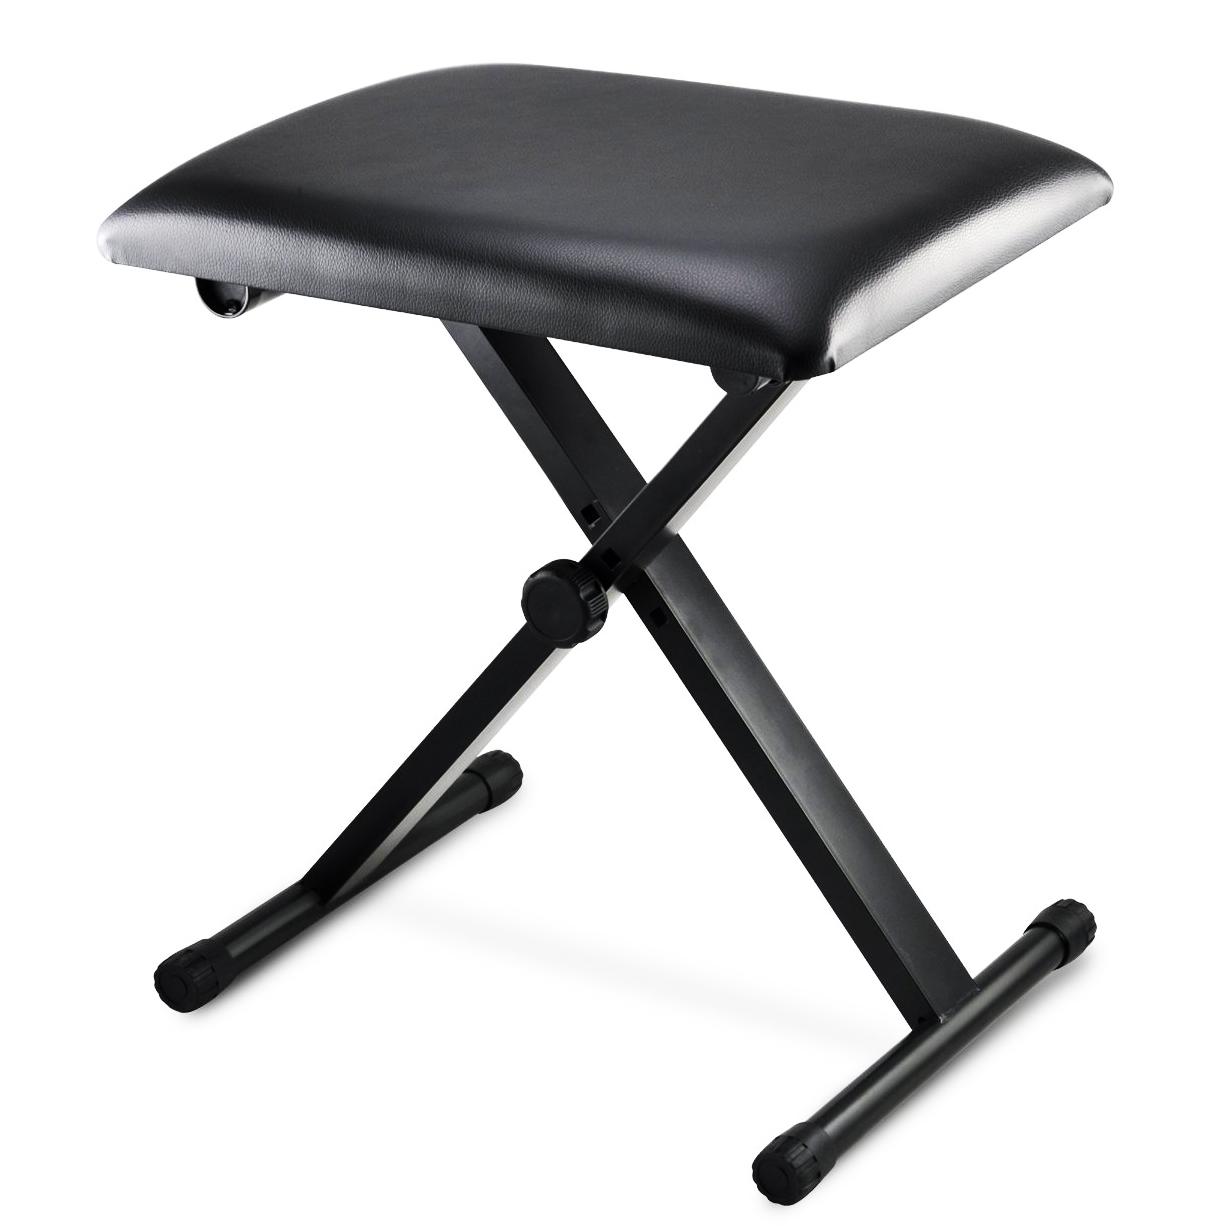 Keyboard Piano Bench Stool Seat Chair Throne Adjustable Portable  sc 1 st  Oypla & Keyboard Piano Bench Stool Seat Chair Throne Adjustable Portable ... islam-shia.org